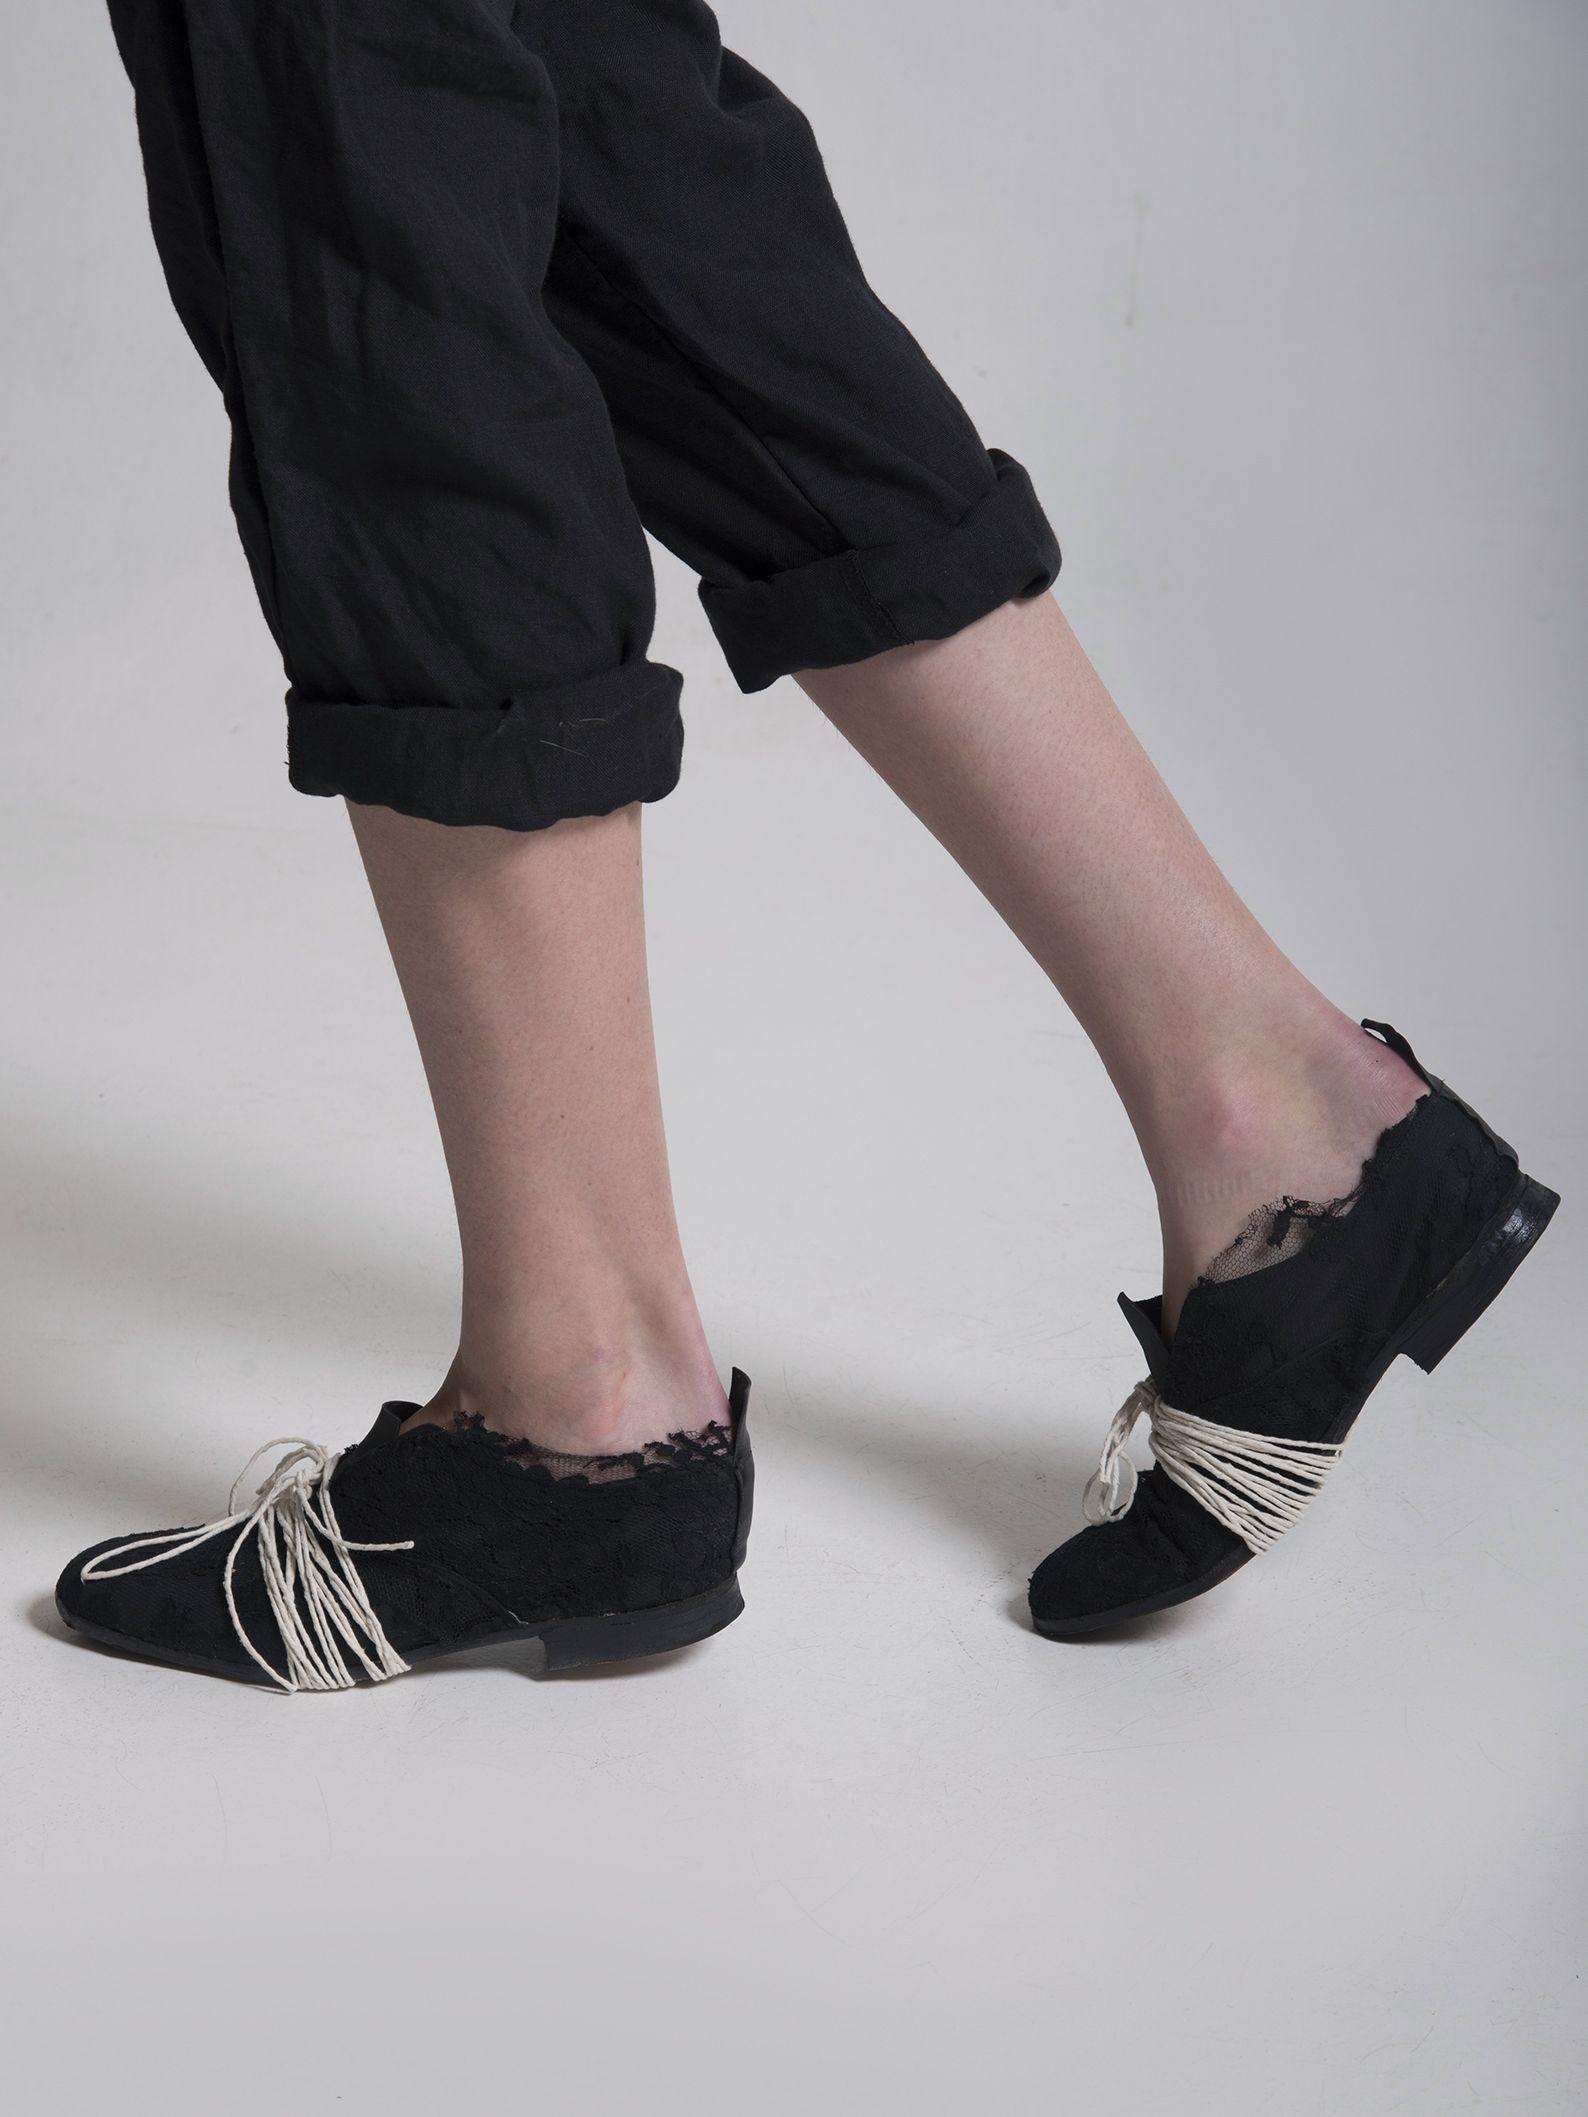 Elena Leder Dawson Leder Elena Lace Up Schuhes with Lace Appliqué | Elena dawson 5459de